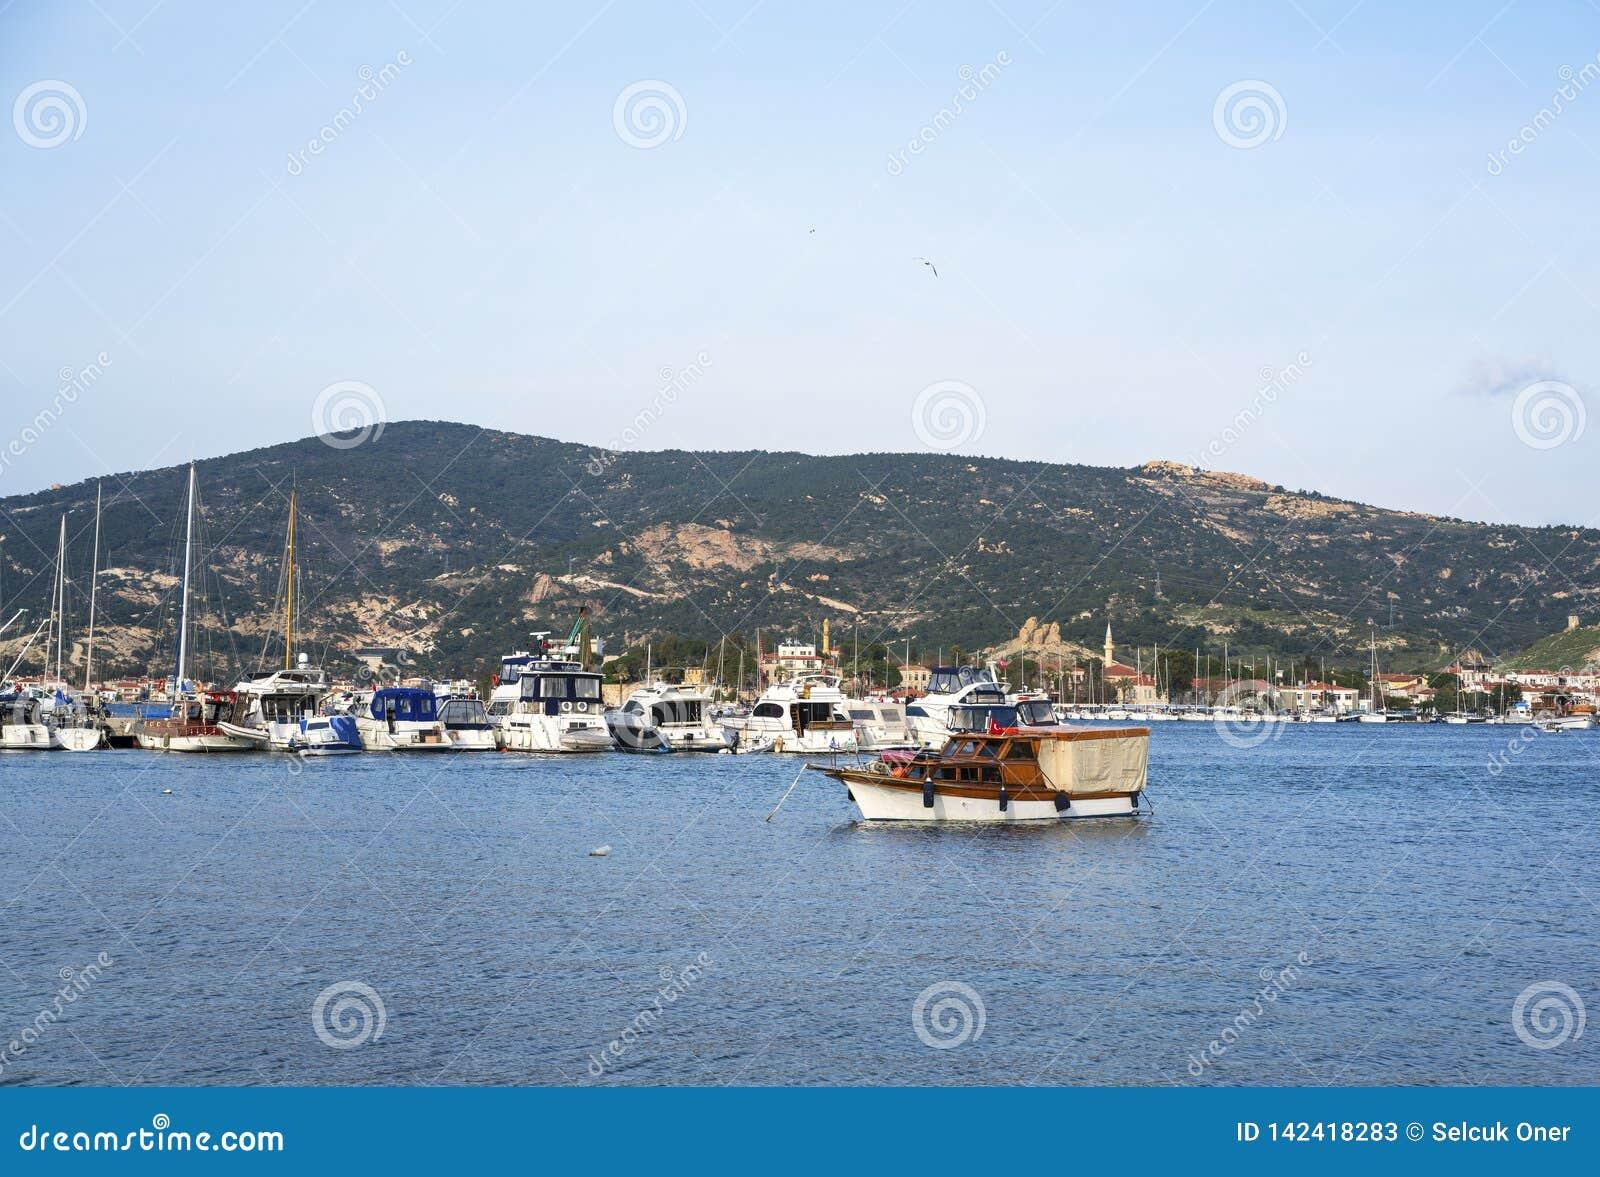 Foca,  Fokaia izmir, Turkey